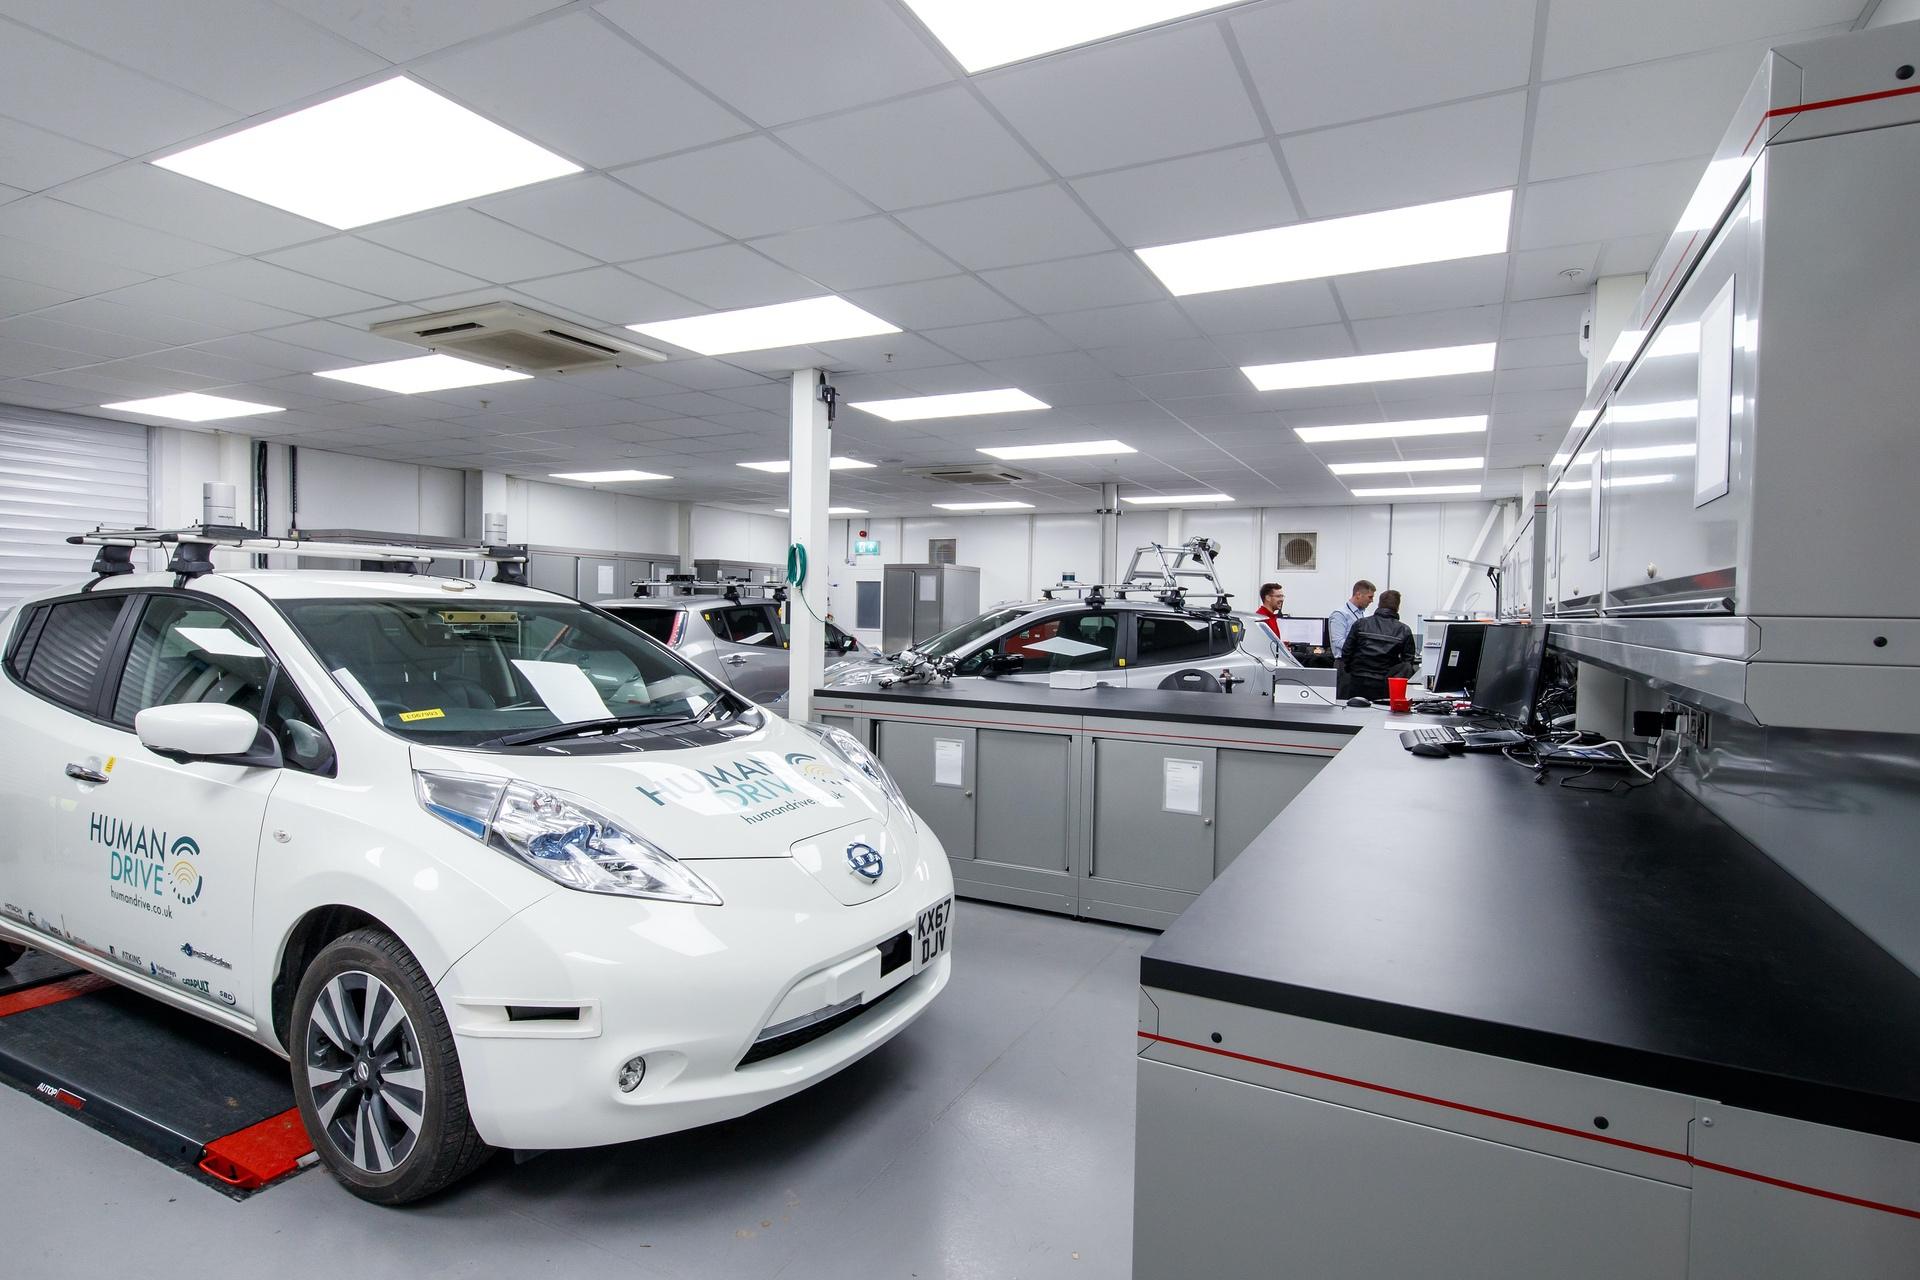 Nissan_Leaf_HumanDrive_0048